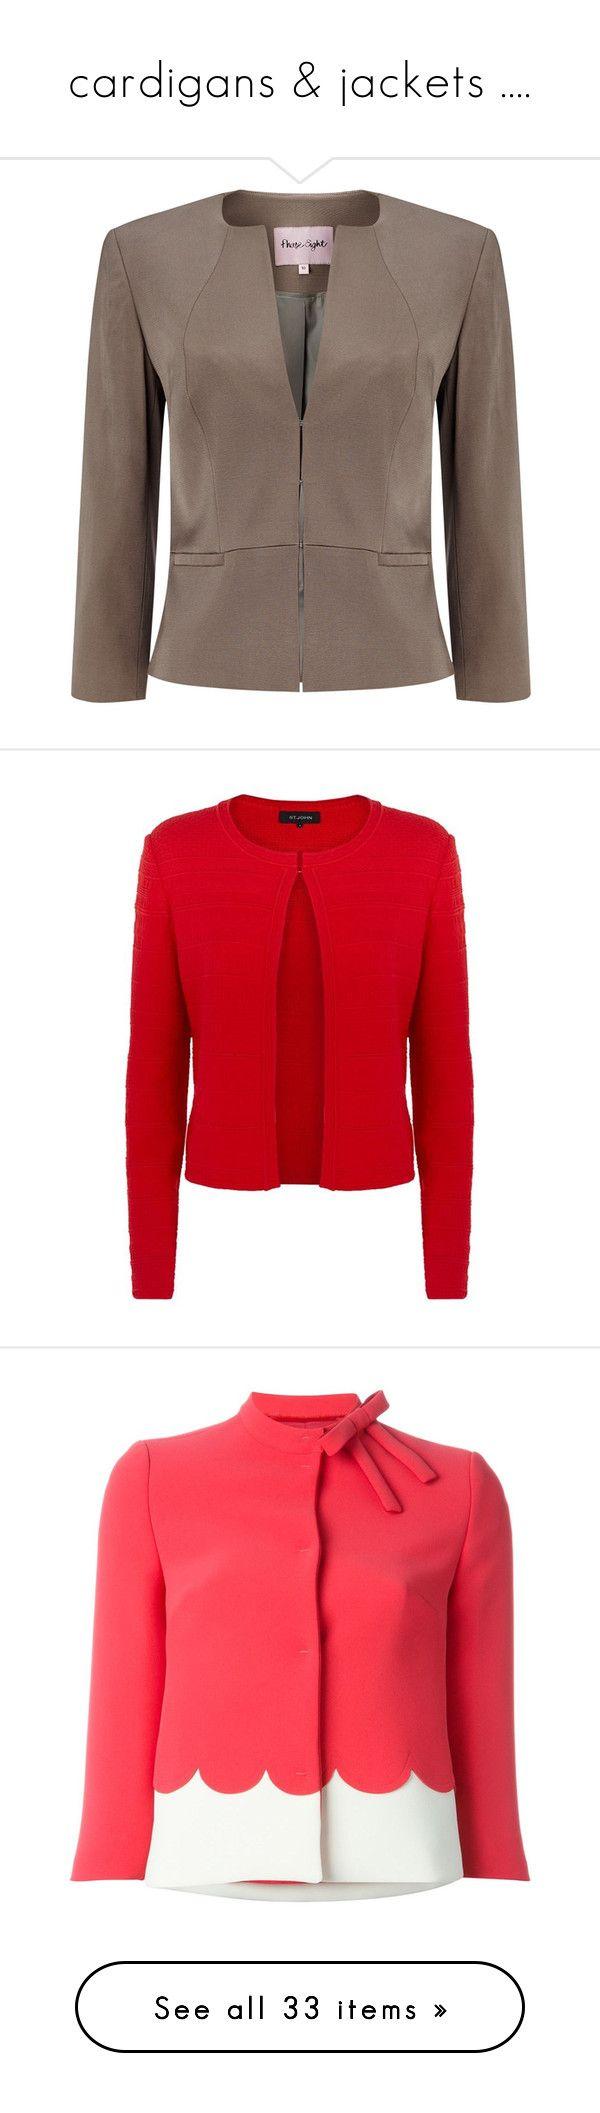 """cardigans & jackets ...."" by prettyangel-1 on Polyvore featuring outerwear, jackets, 3/4 sleeve jacket, collarless jacket, evening jackets, brown jacket, short jacket, blazers, travel blazer et zip front jacket"